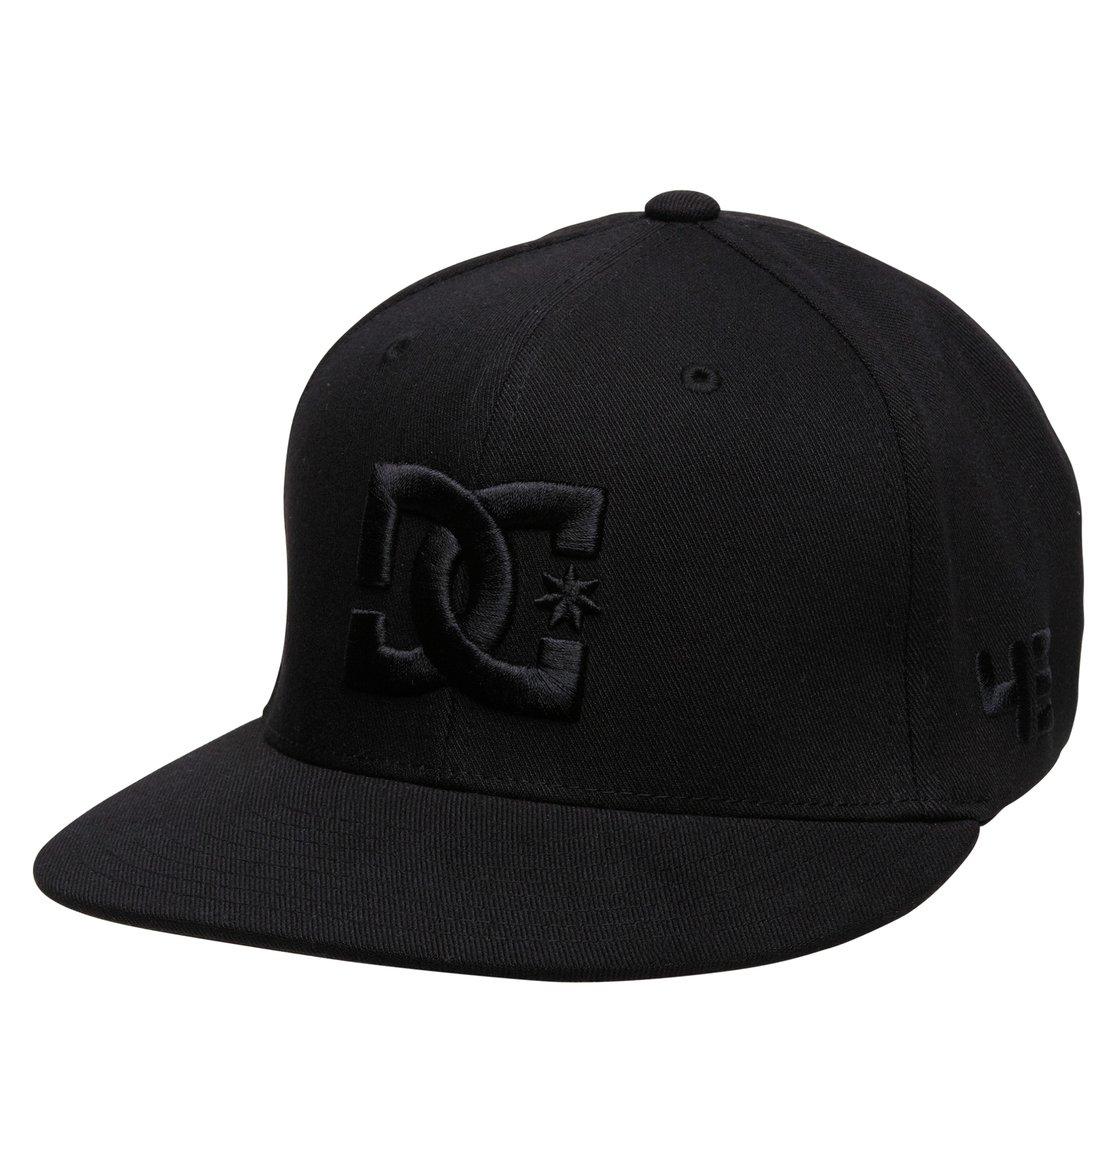 4bea3c52377 0 Men s Ken Block Blackout Hat ADYHA00188 DC Shoes